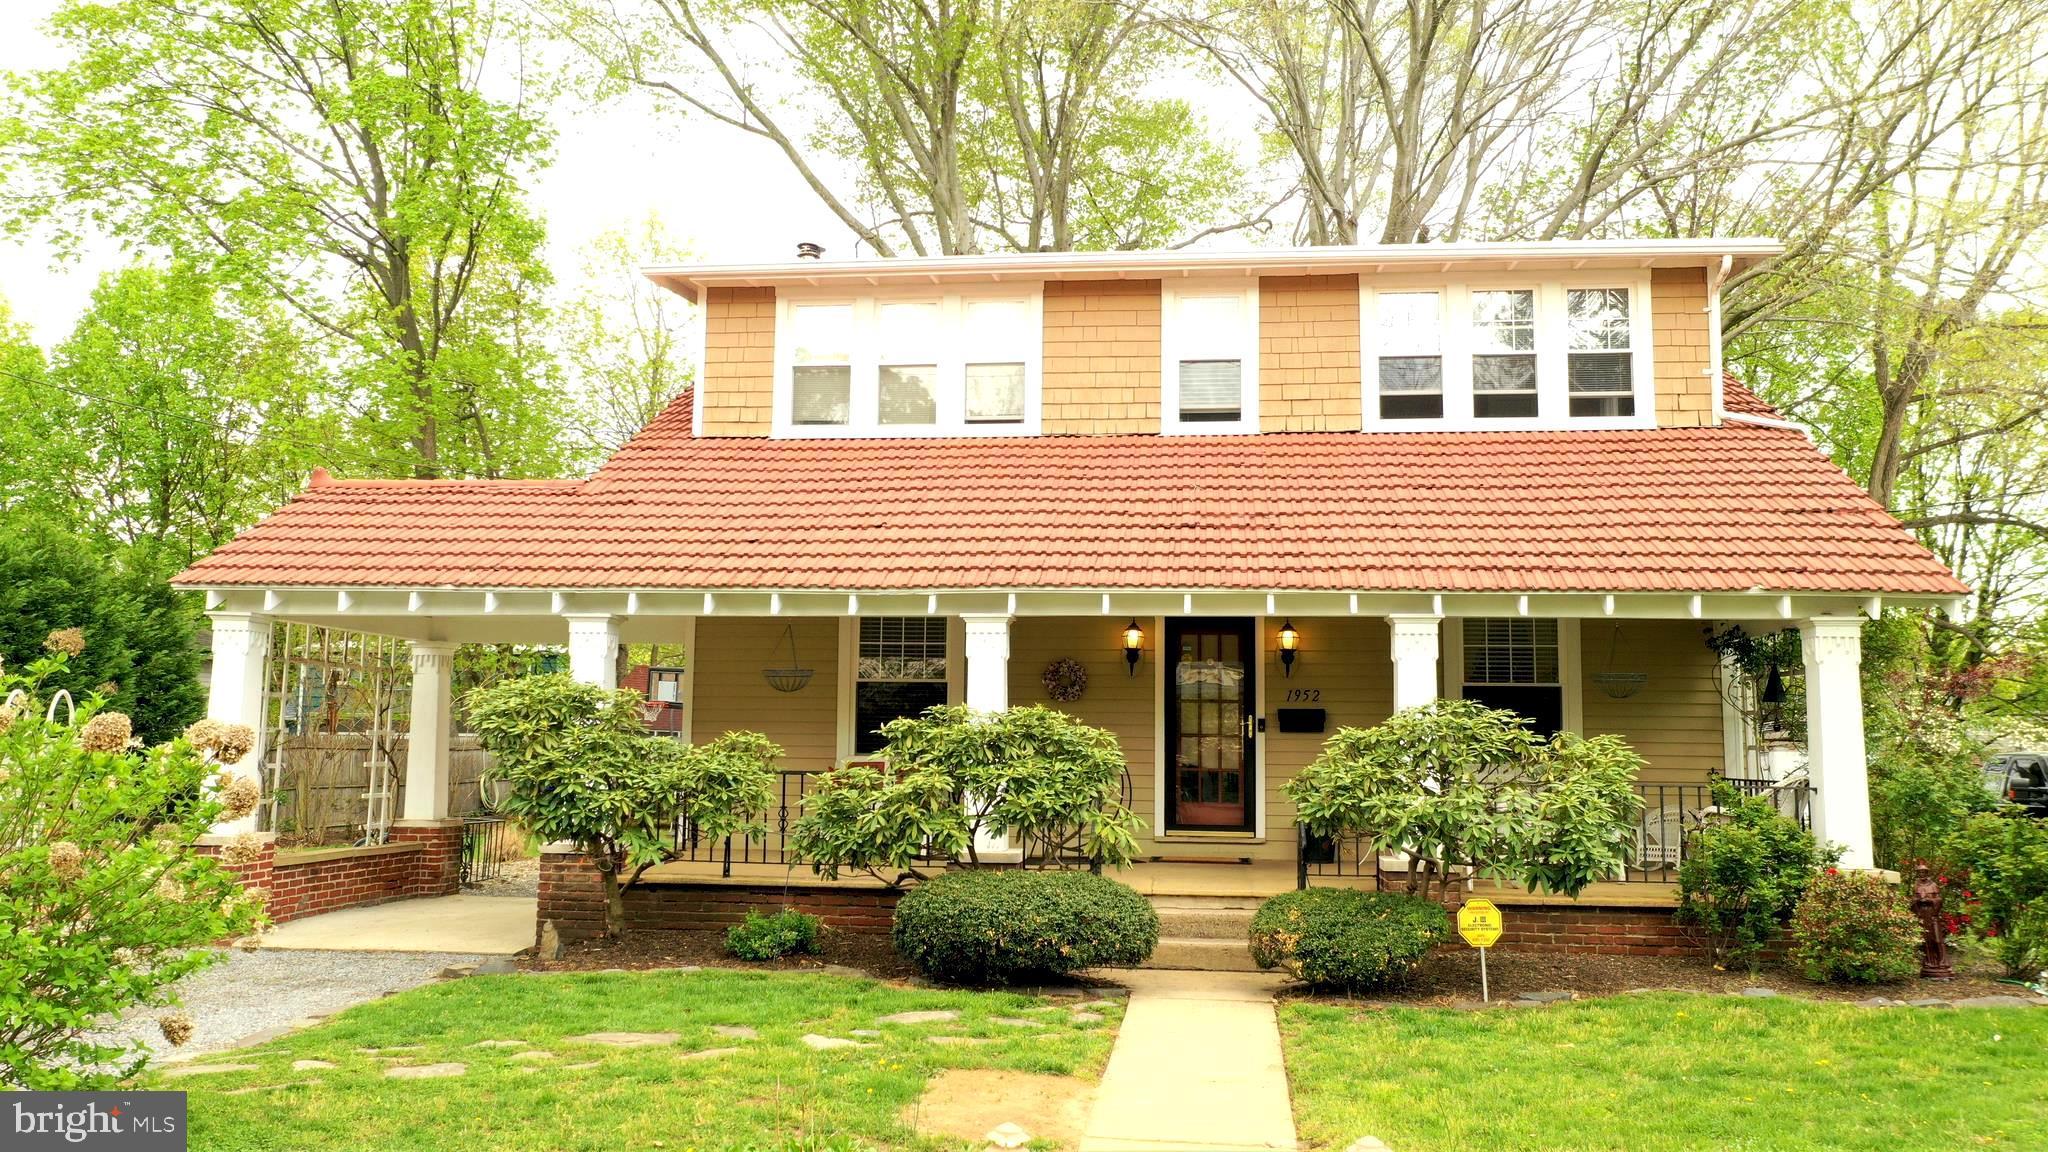 1952 E MCGALLIARD AVE, HAMILTON, NJ 08610